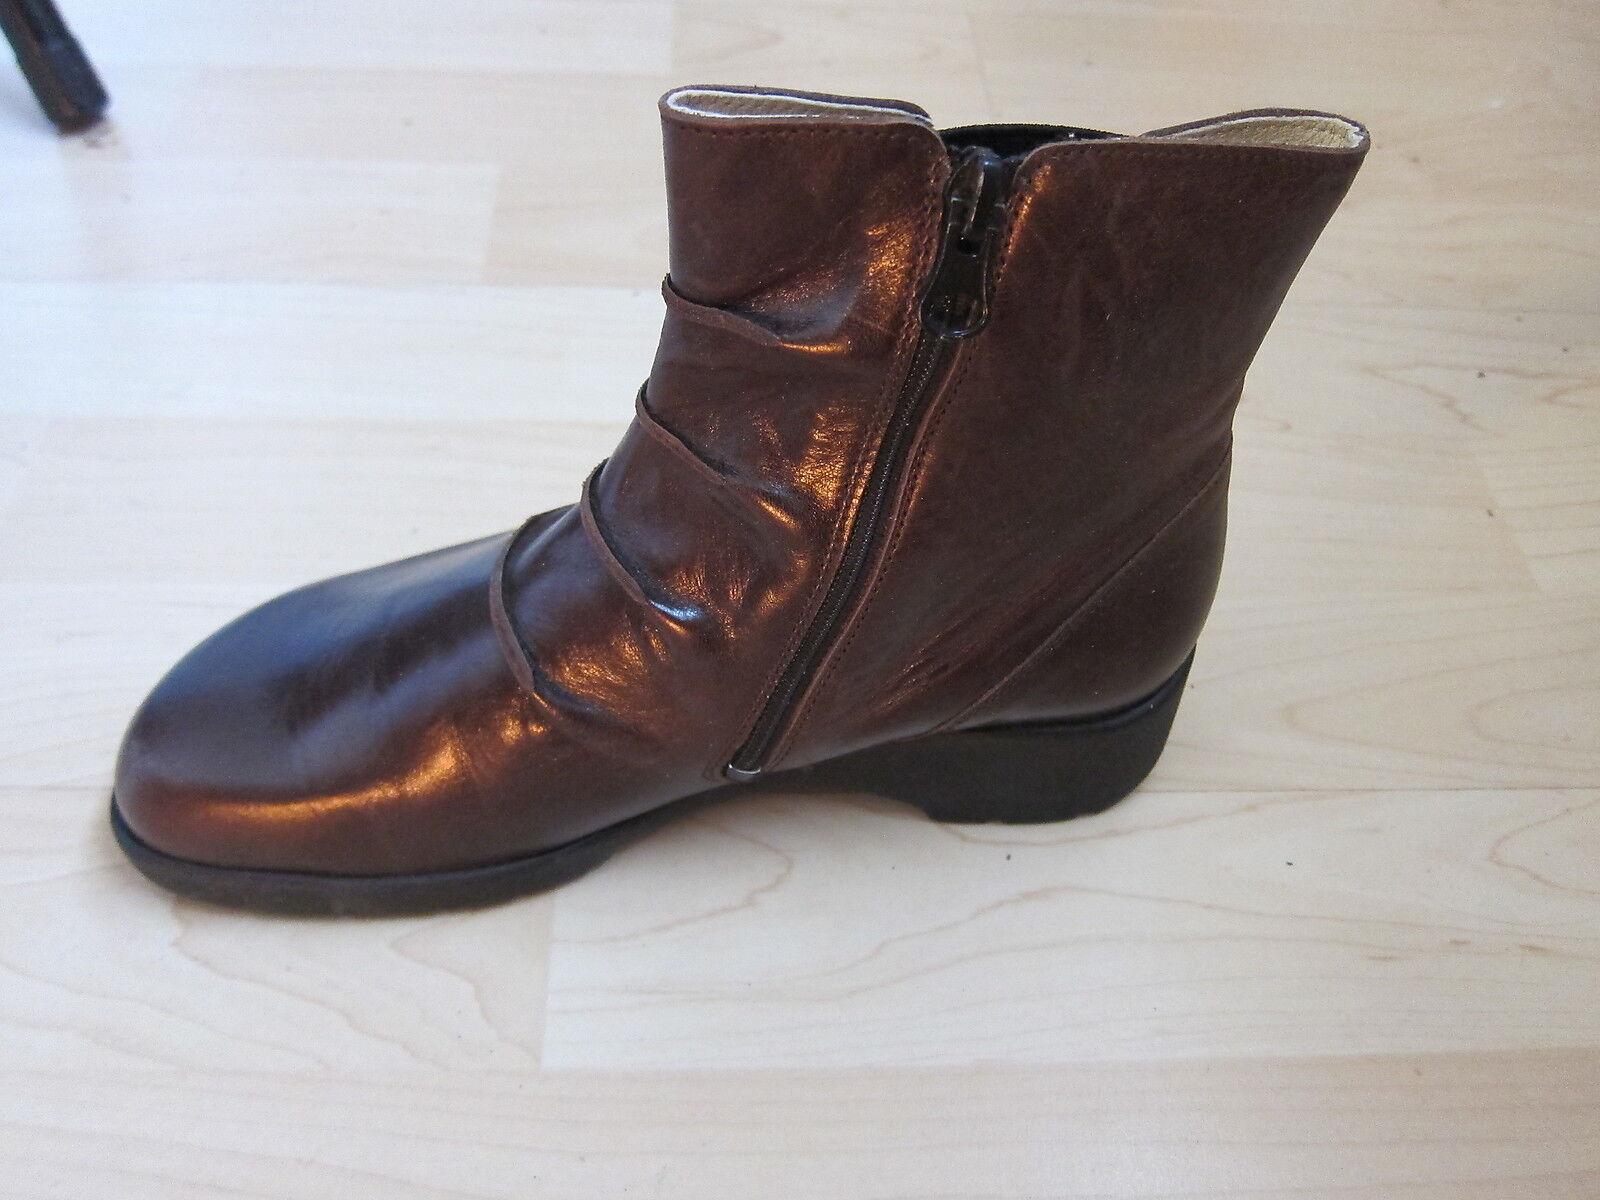 Grandes zapatos con descuento BERKEMANN Stiefel Unikat Damen loses Fußbett Gr.37 #1241#